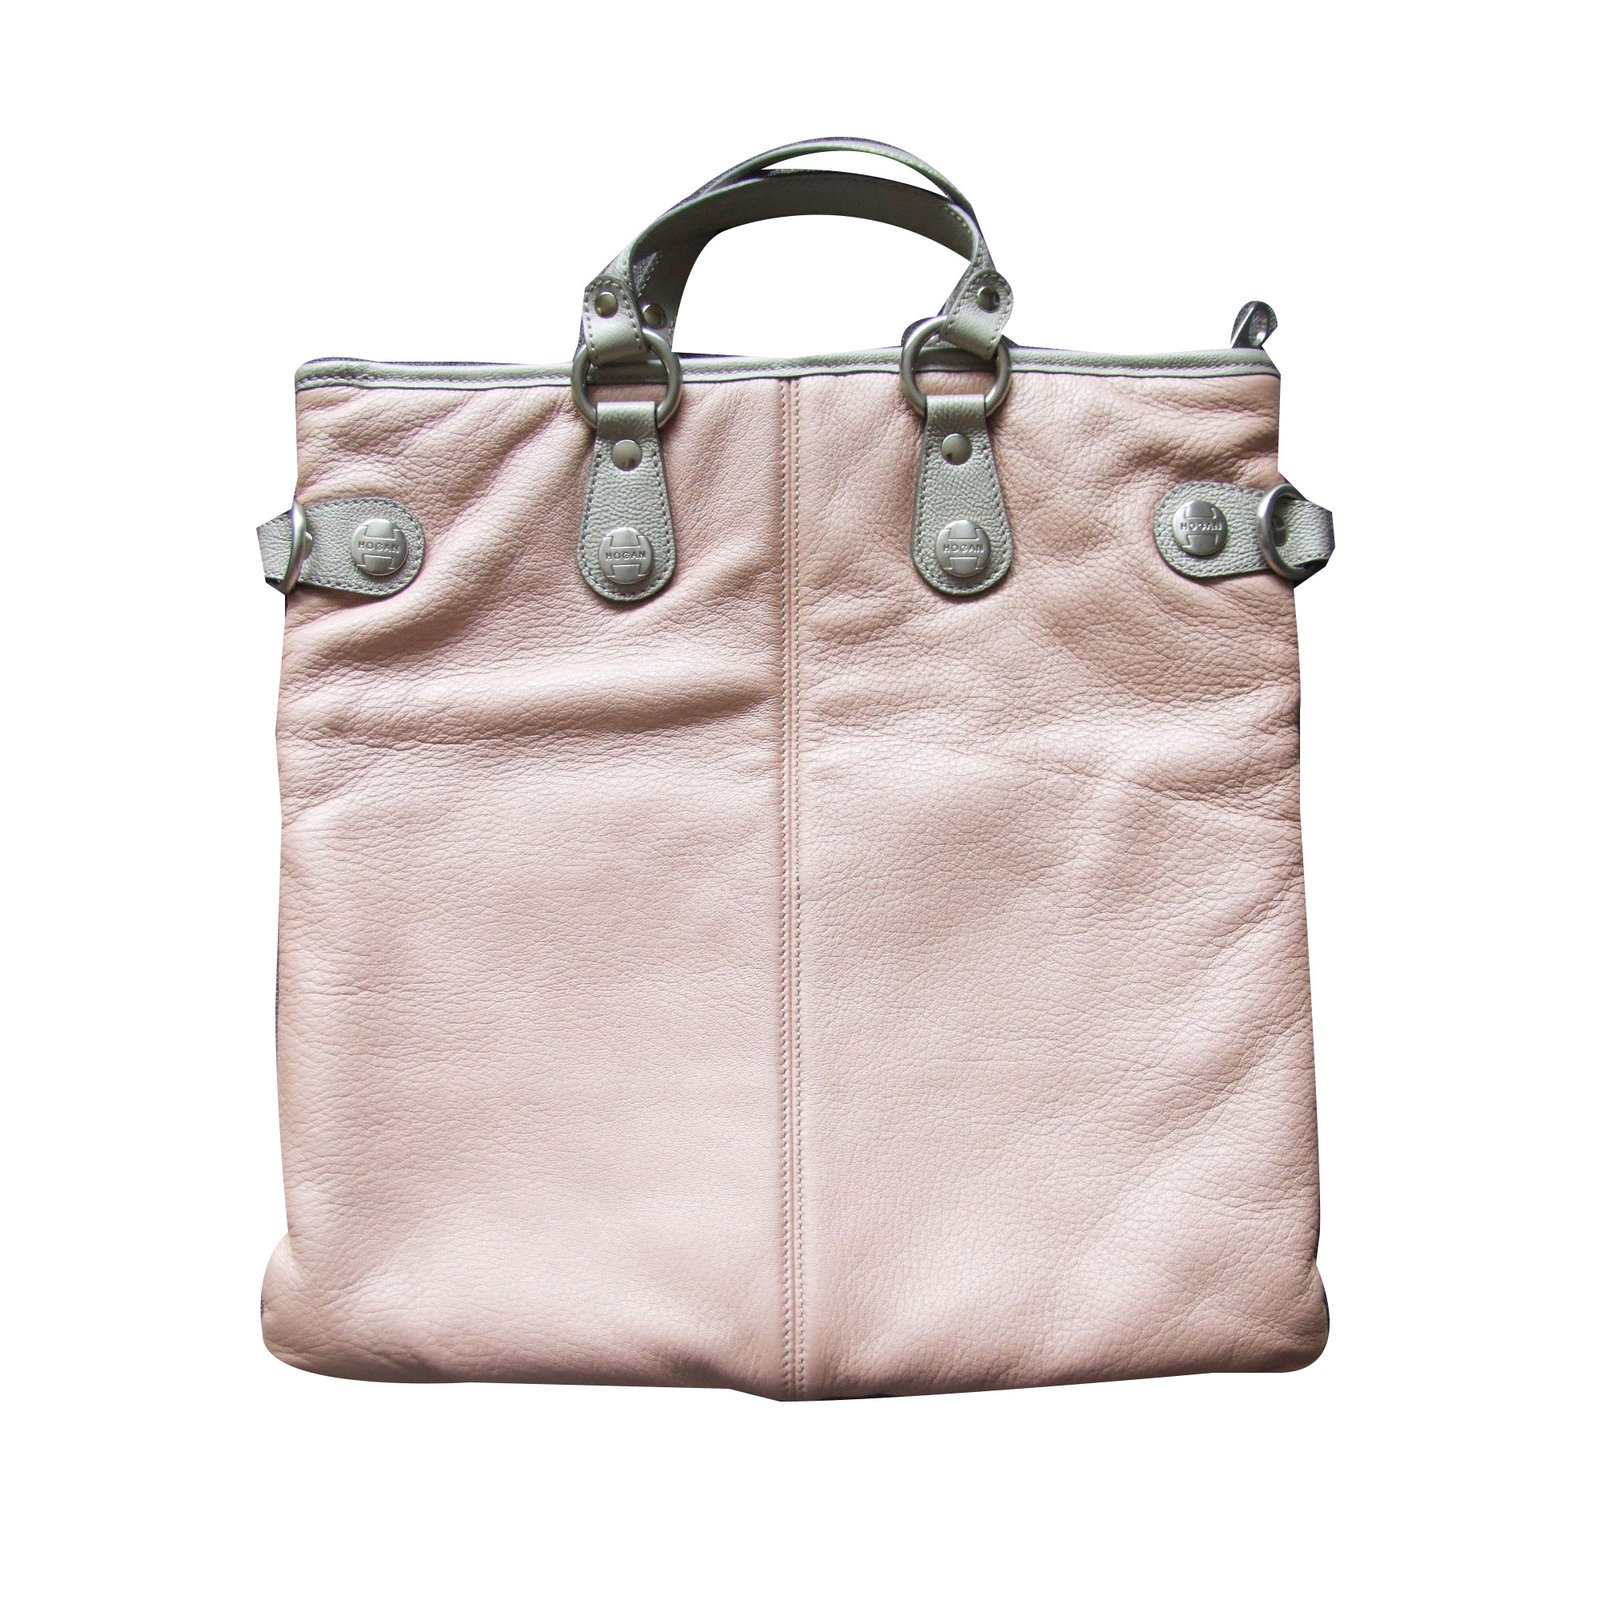 82e395f9c8 Hogan Hogan  Trend Media  bag Handbags Leather Silvery